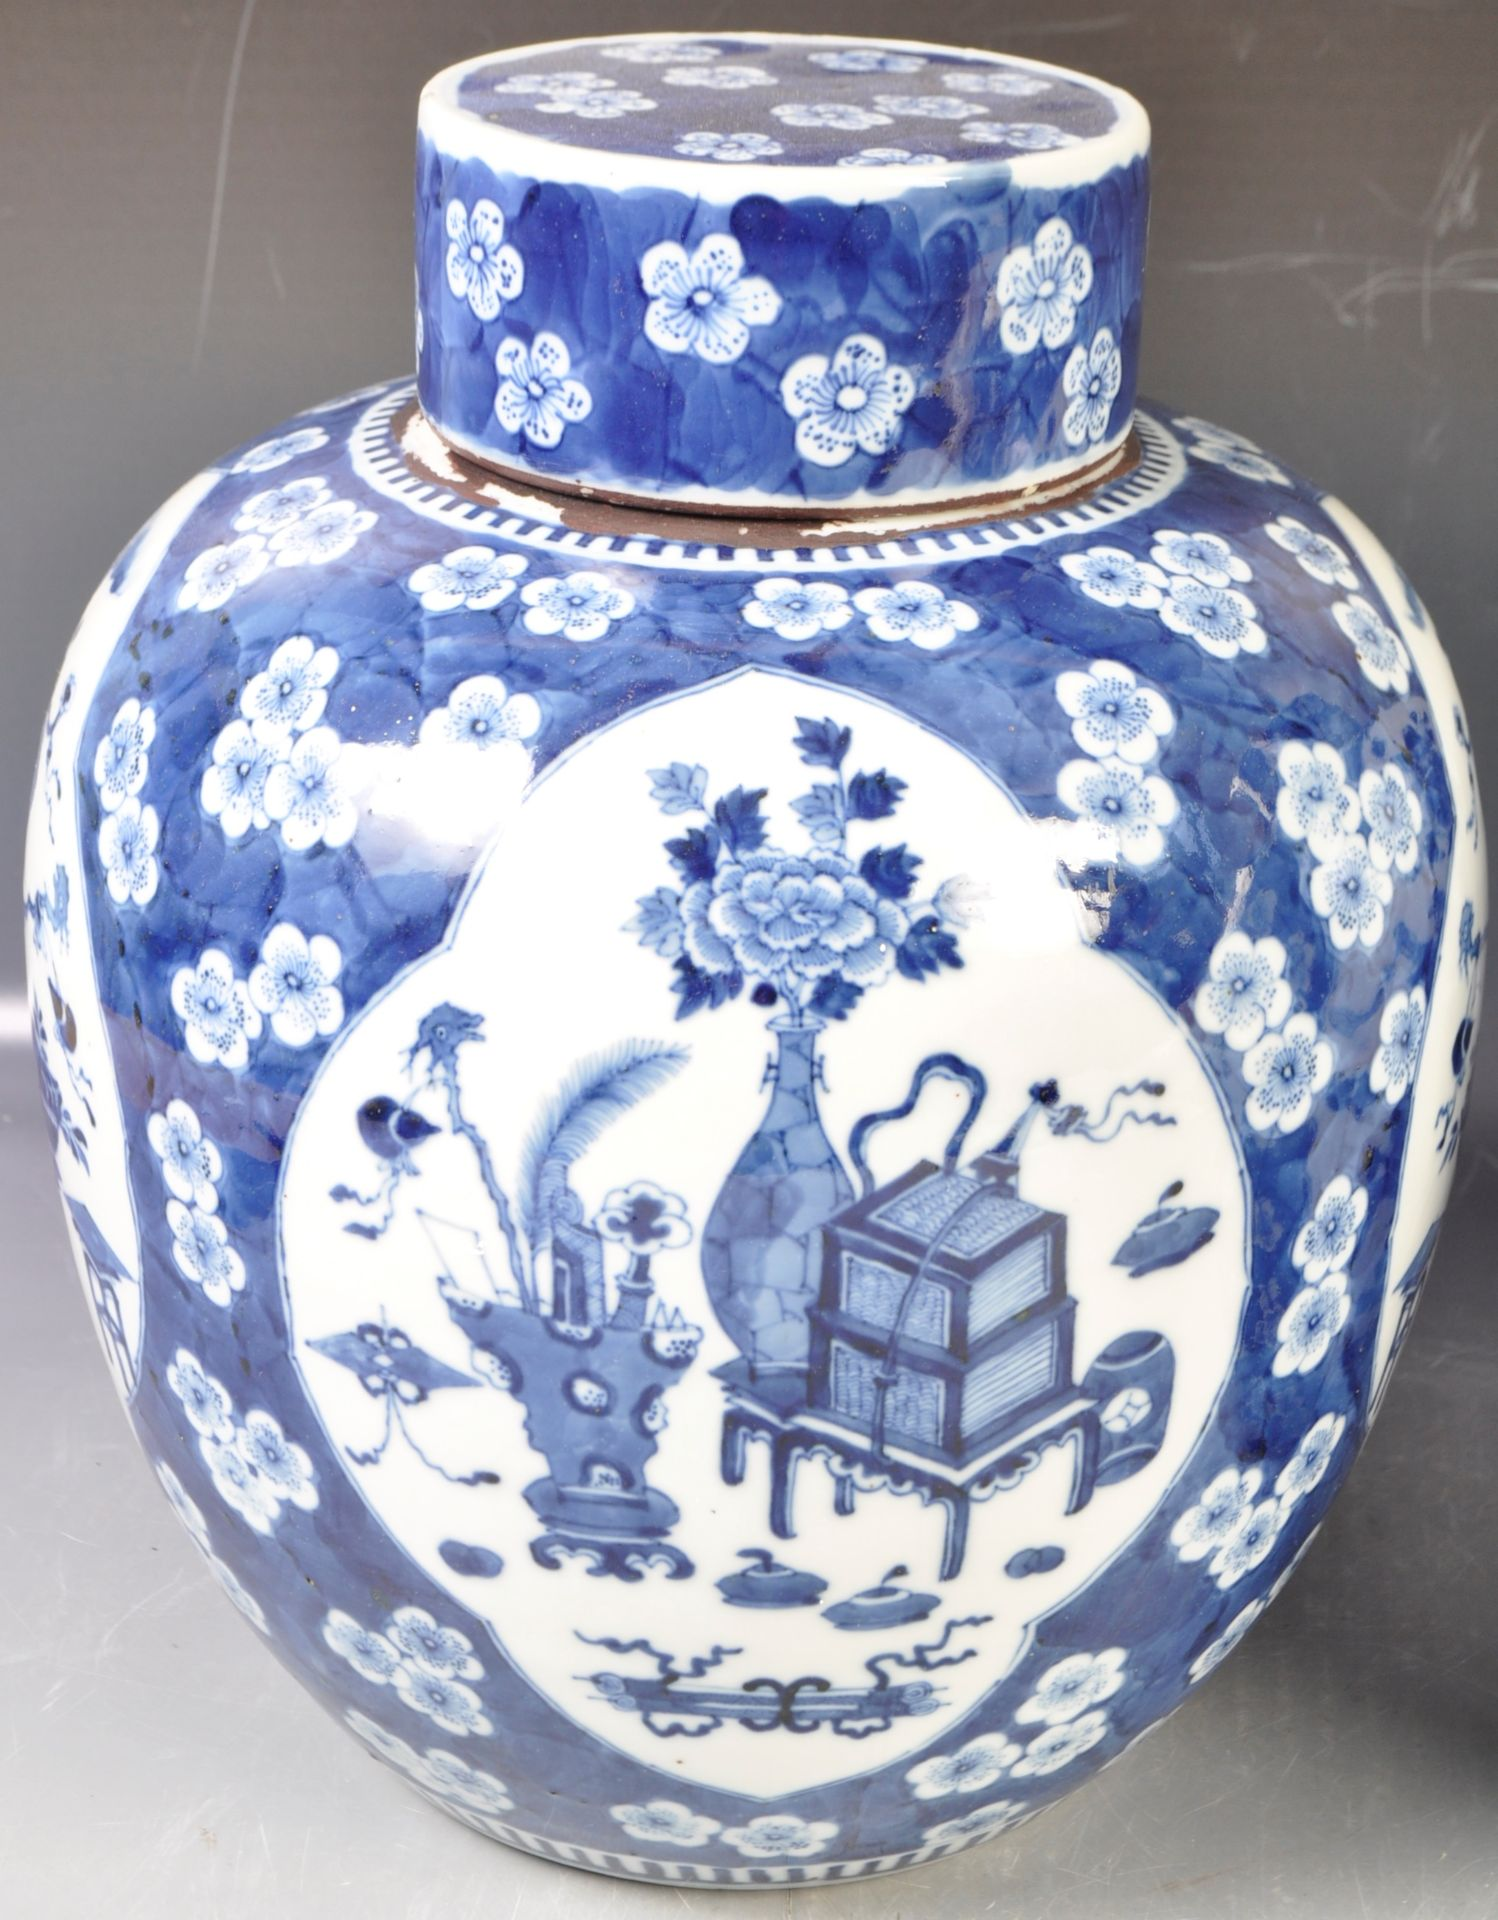 LARGE AND IMPRESSIVE PAIR OF CHINESE KANGXI MARK LIDDED JARS - Image 3 of 13